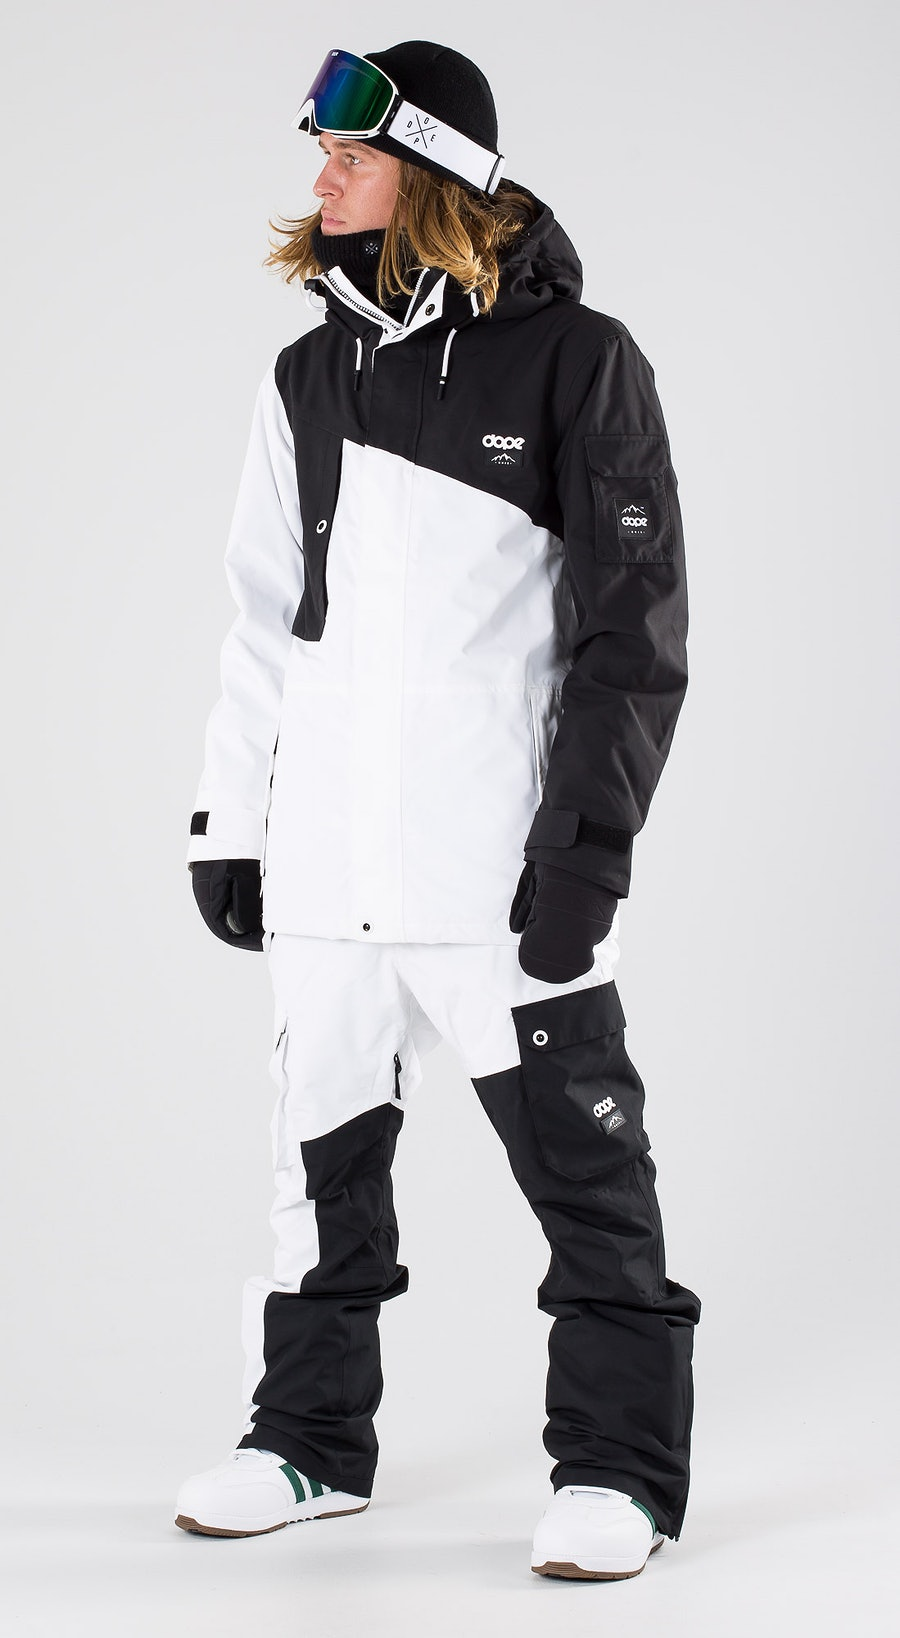 Dope Adept Black/White Snowboardkläder Multi